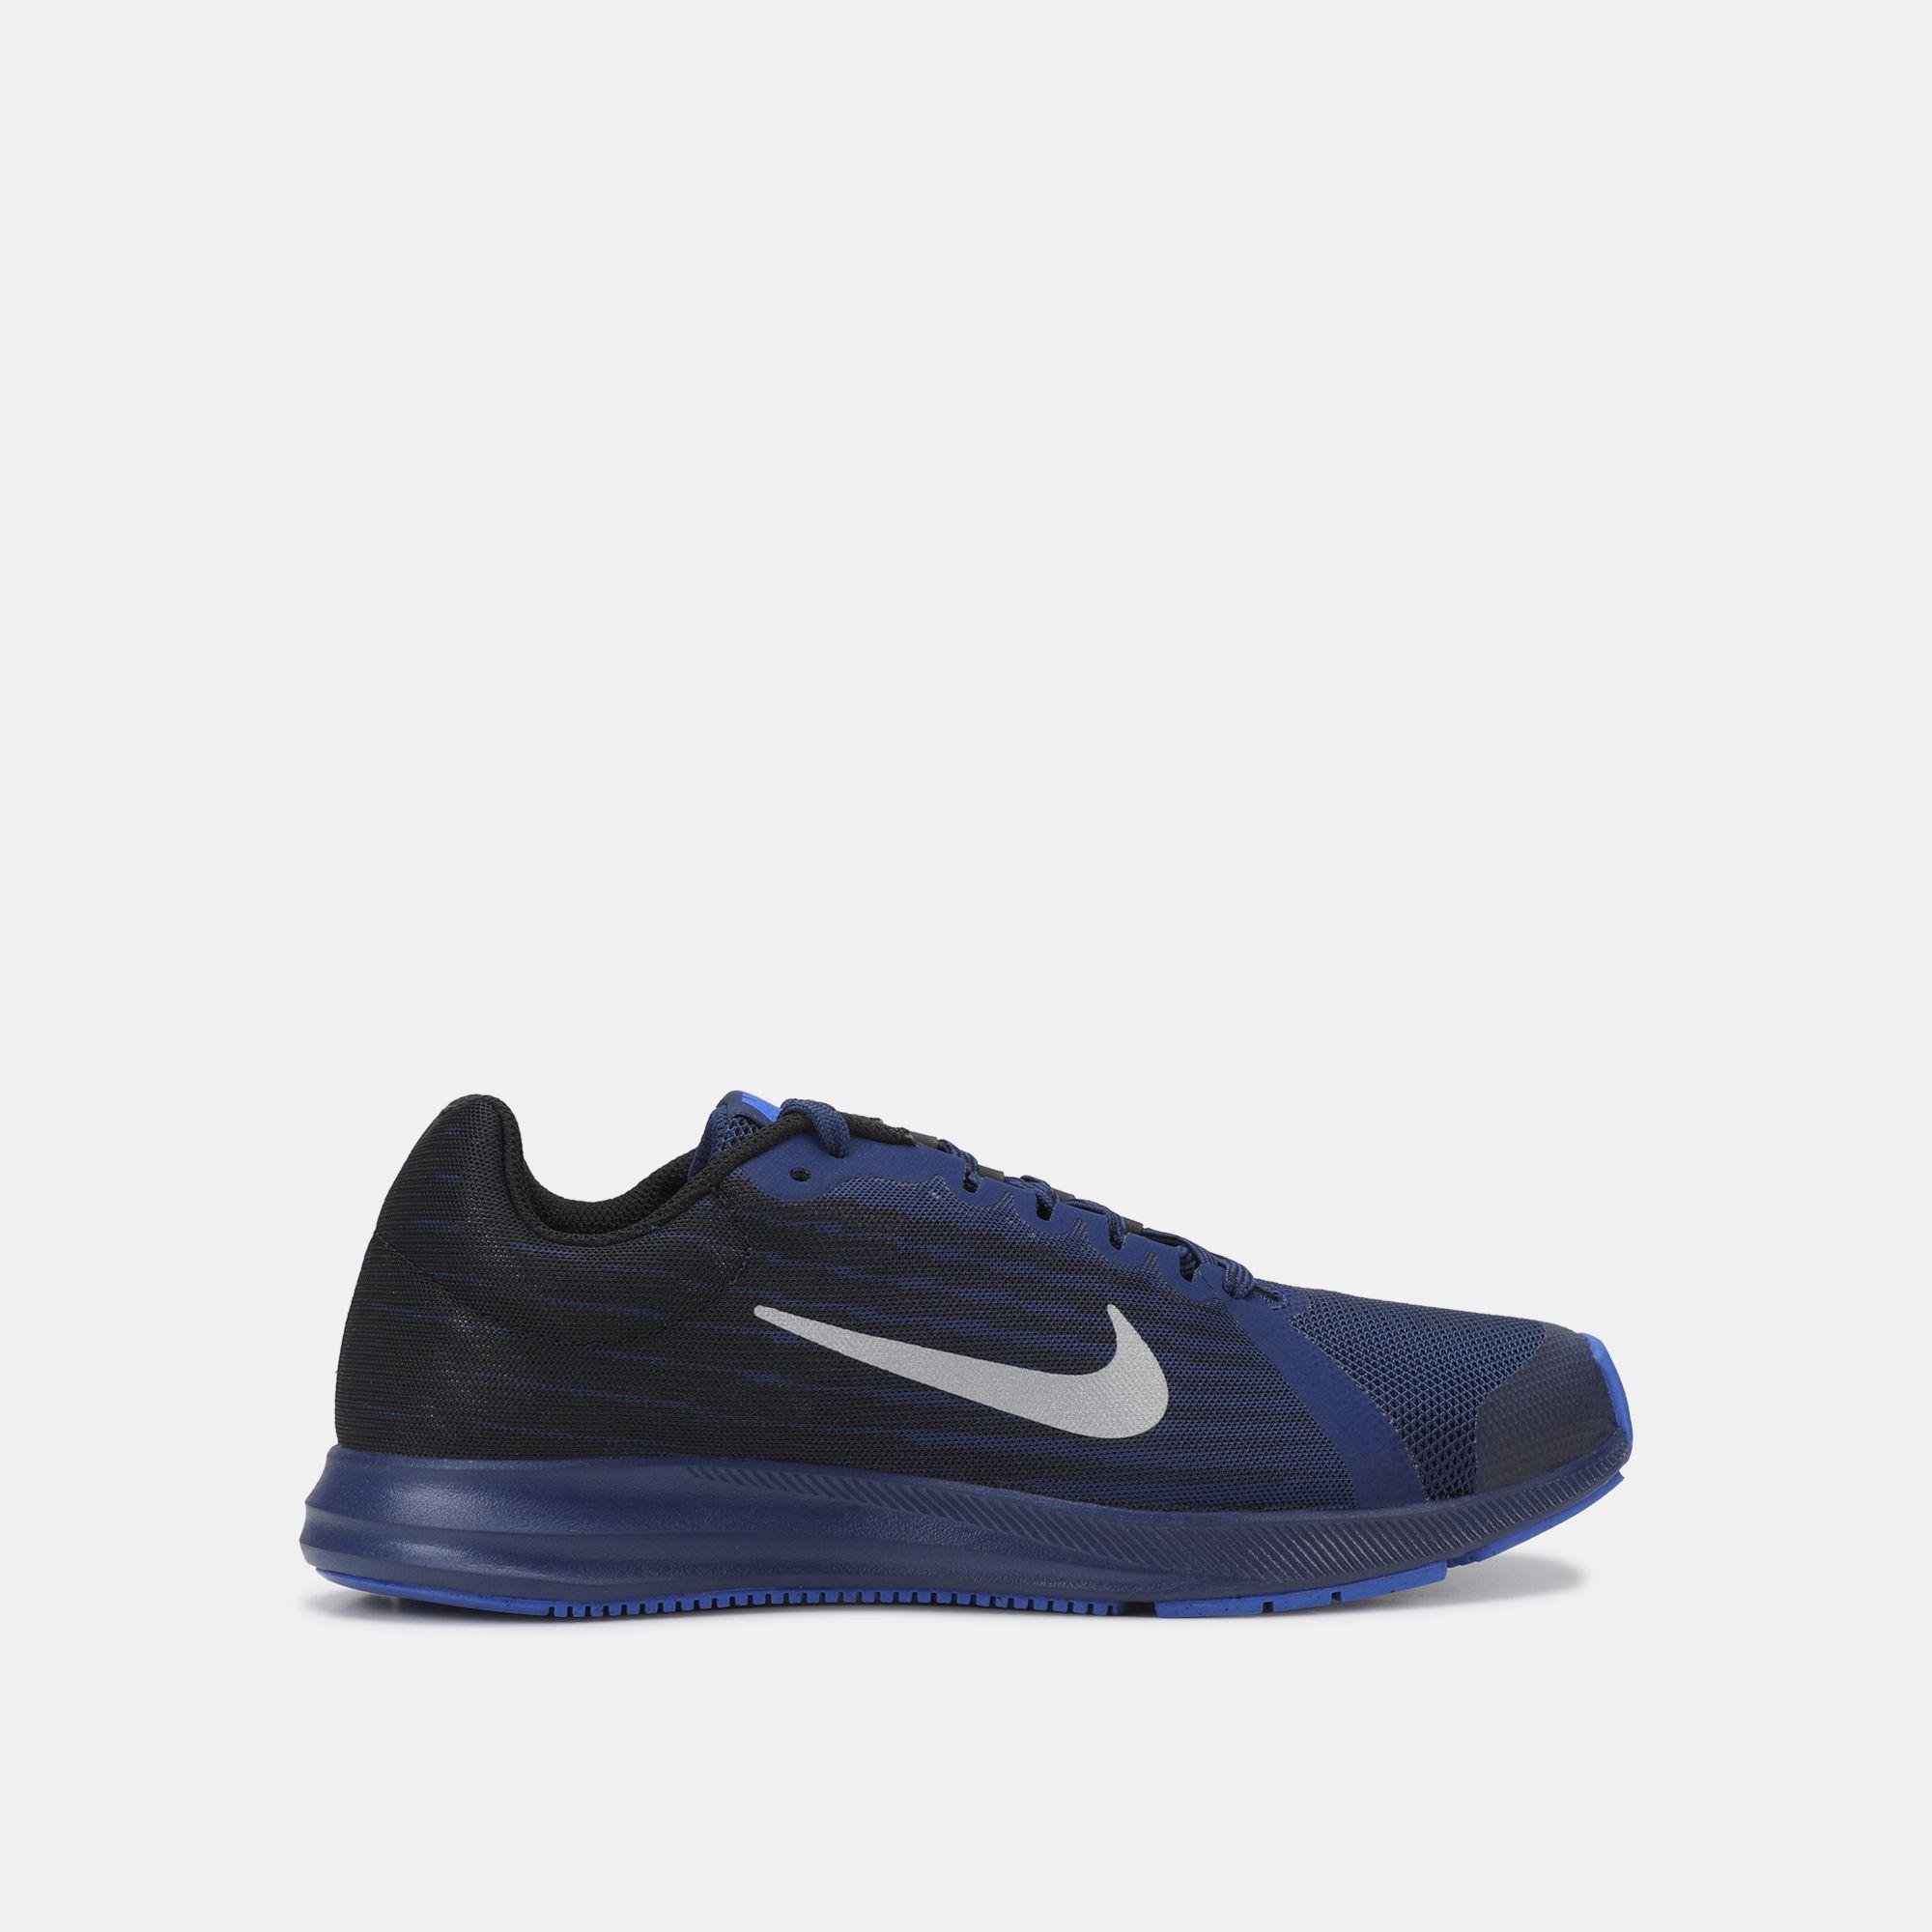 c3bde38434c3 Nike Kids  Downshifter 8 Reflective Running Shoe (Older Kids ...